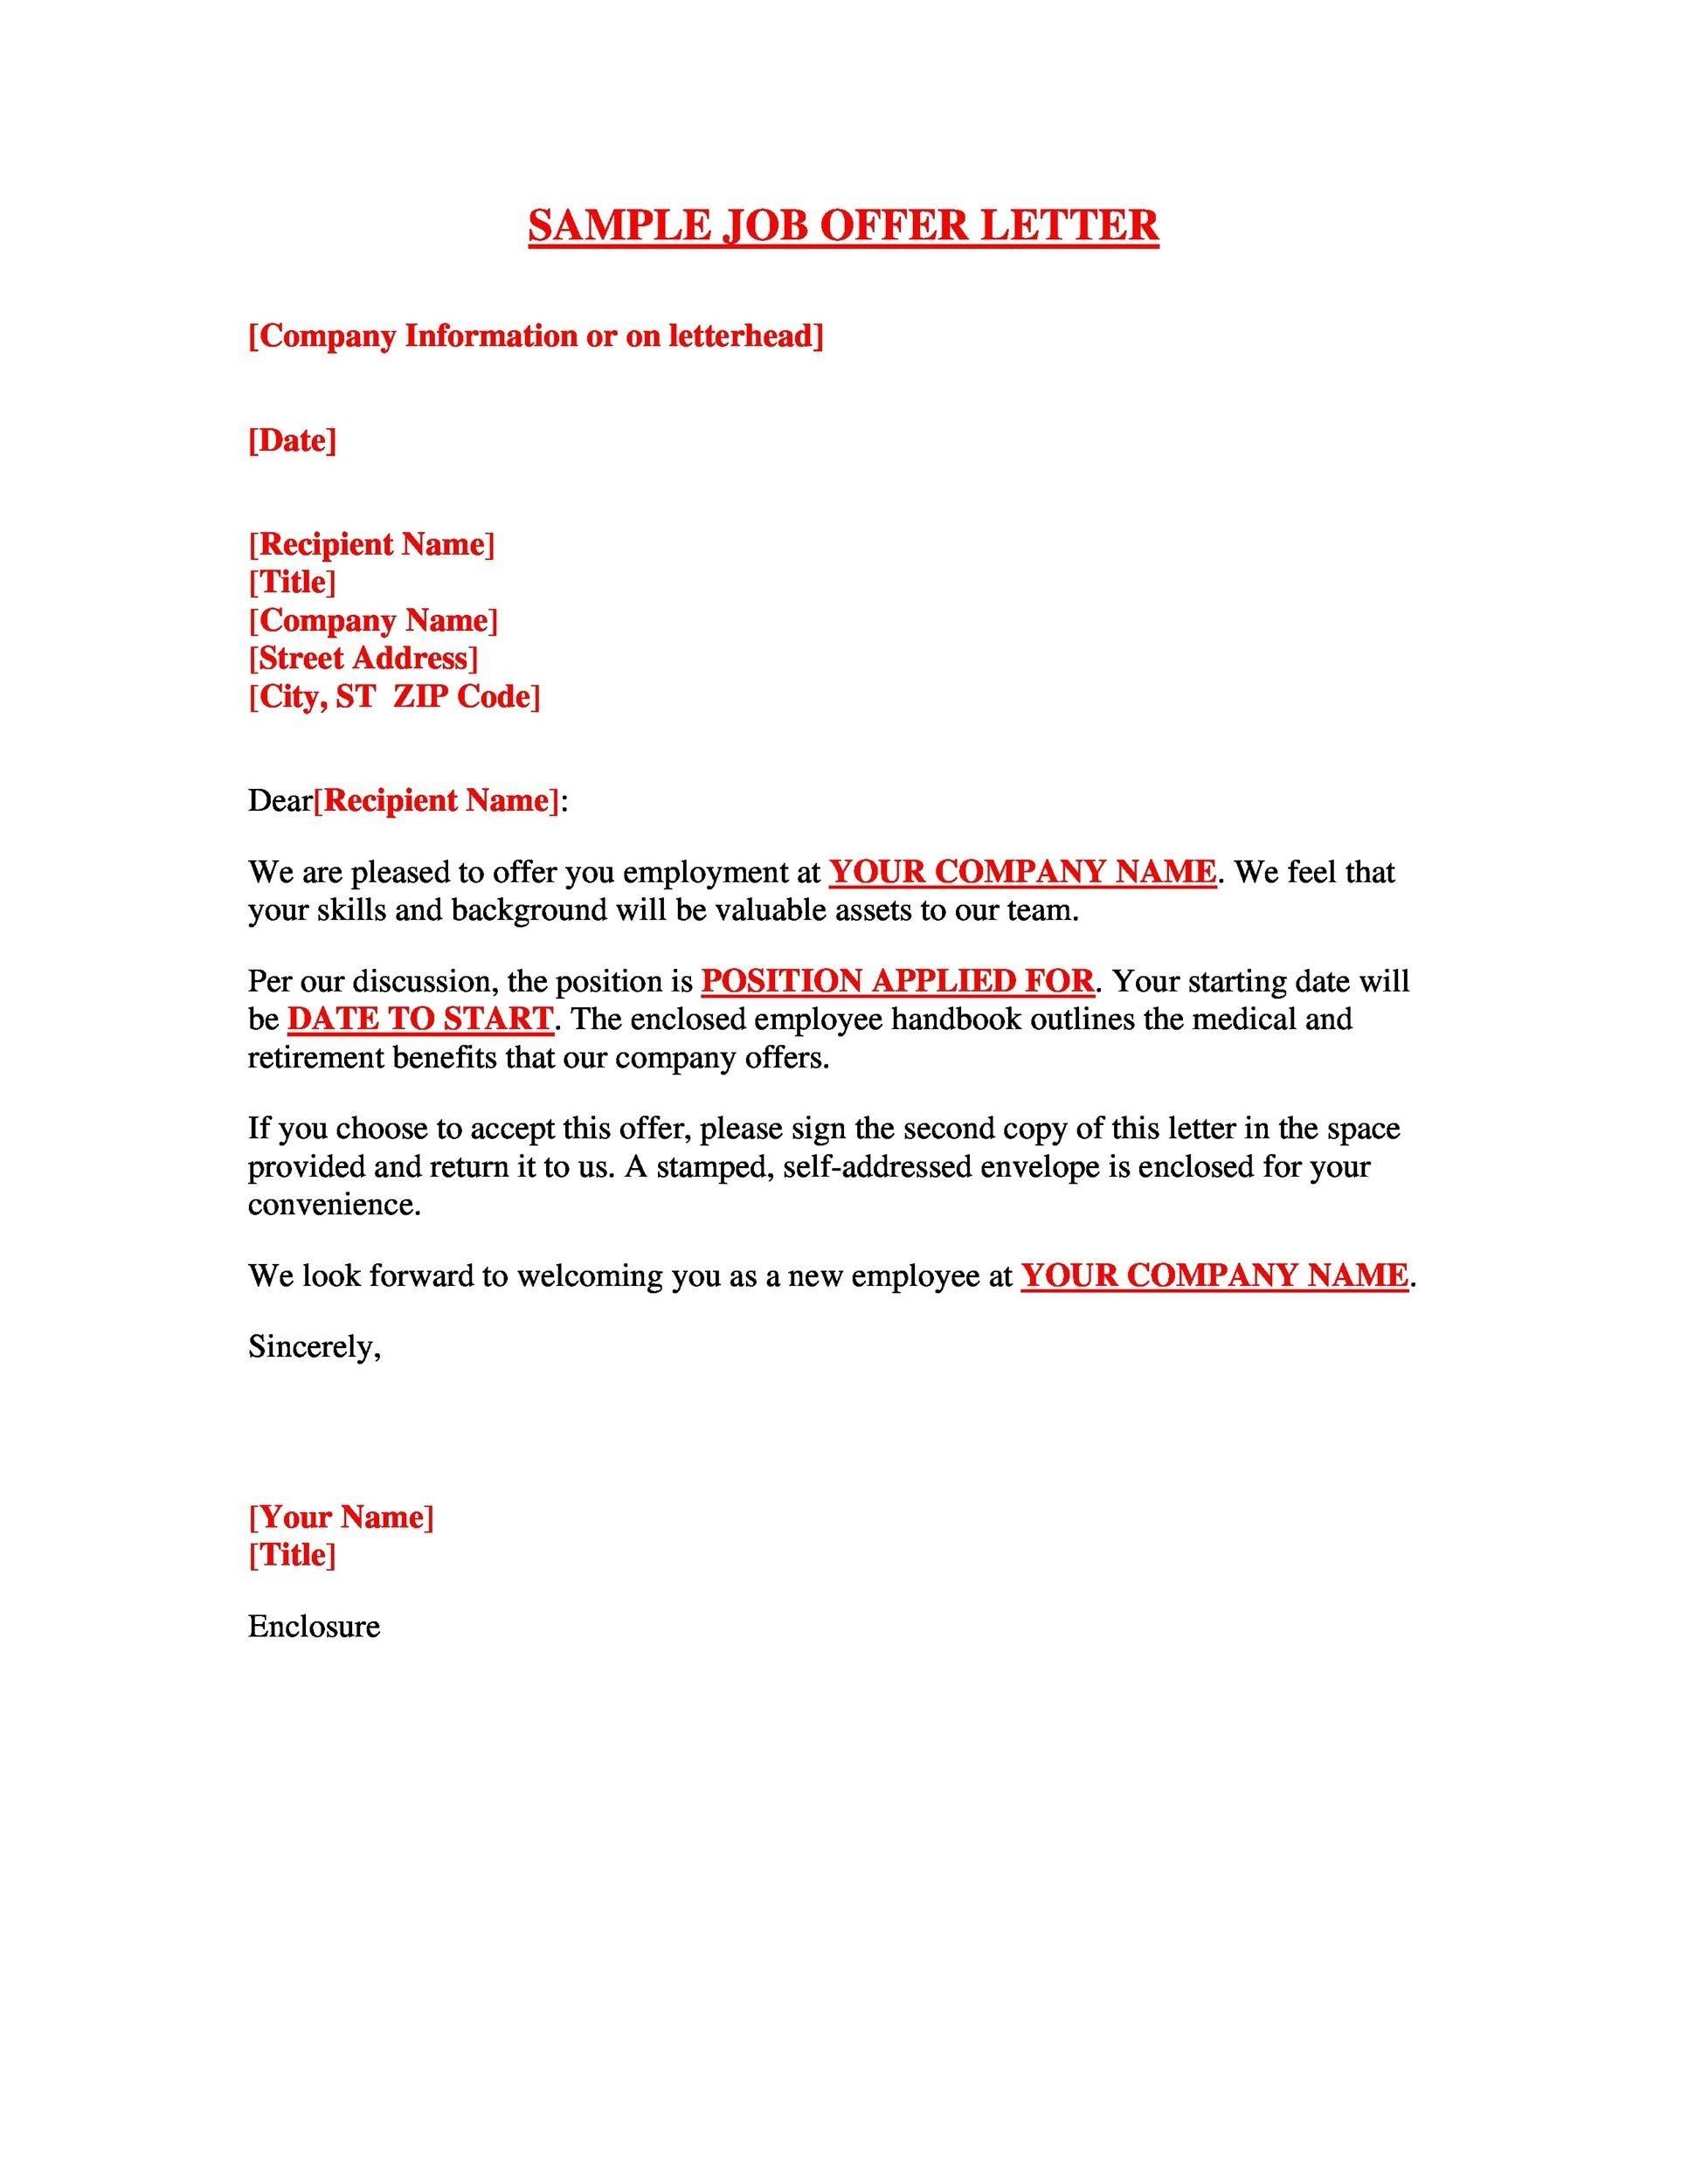 Free Offer letter 18